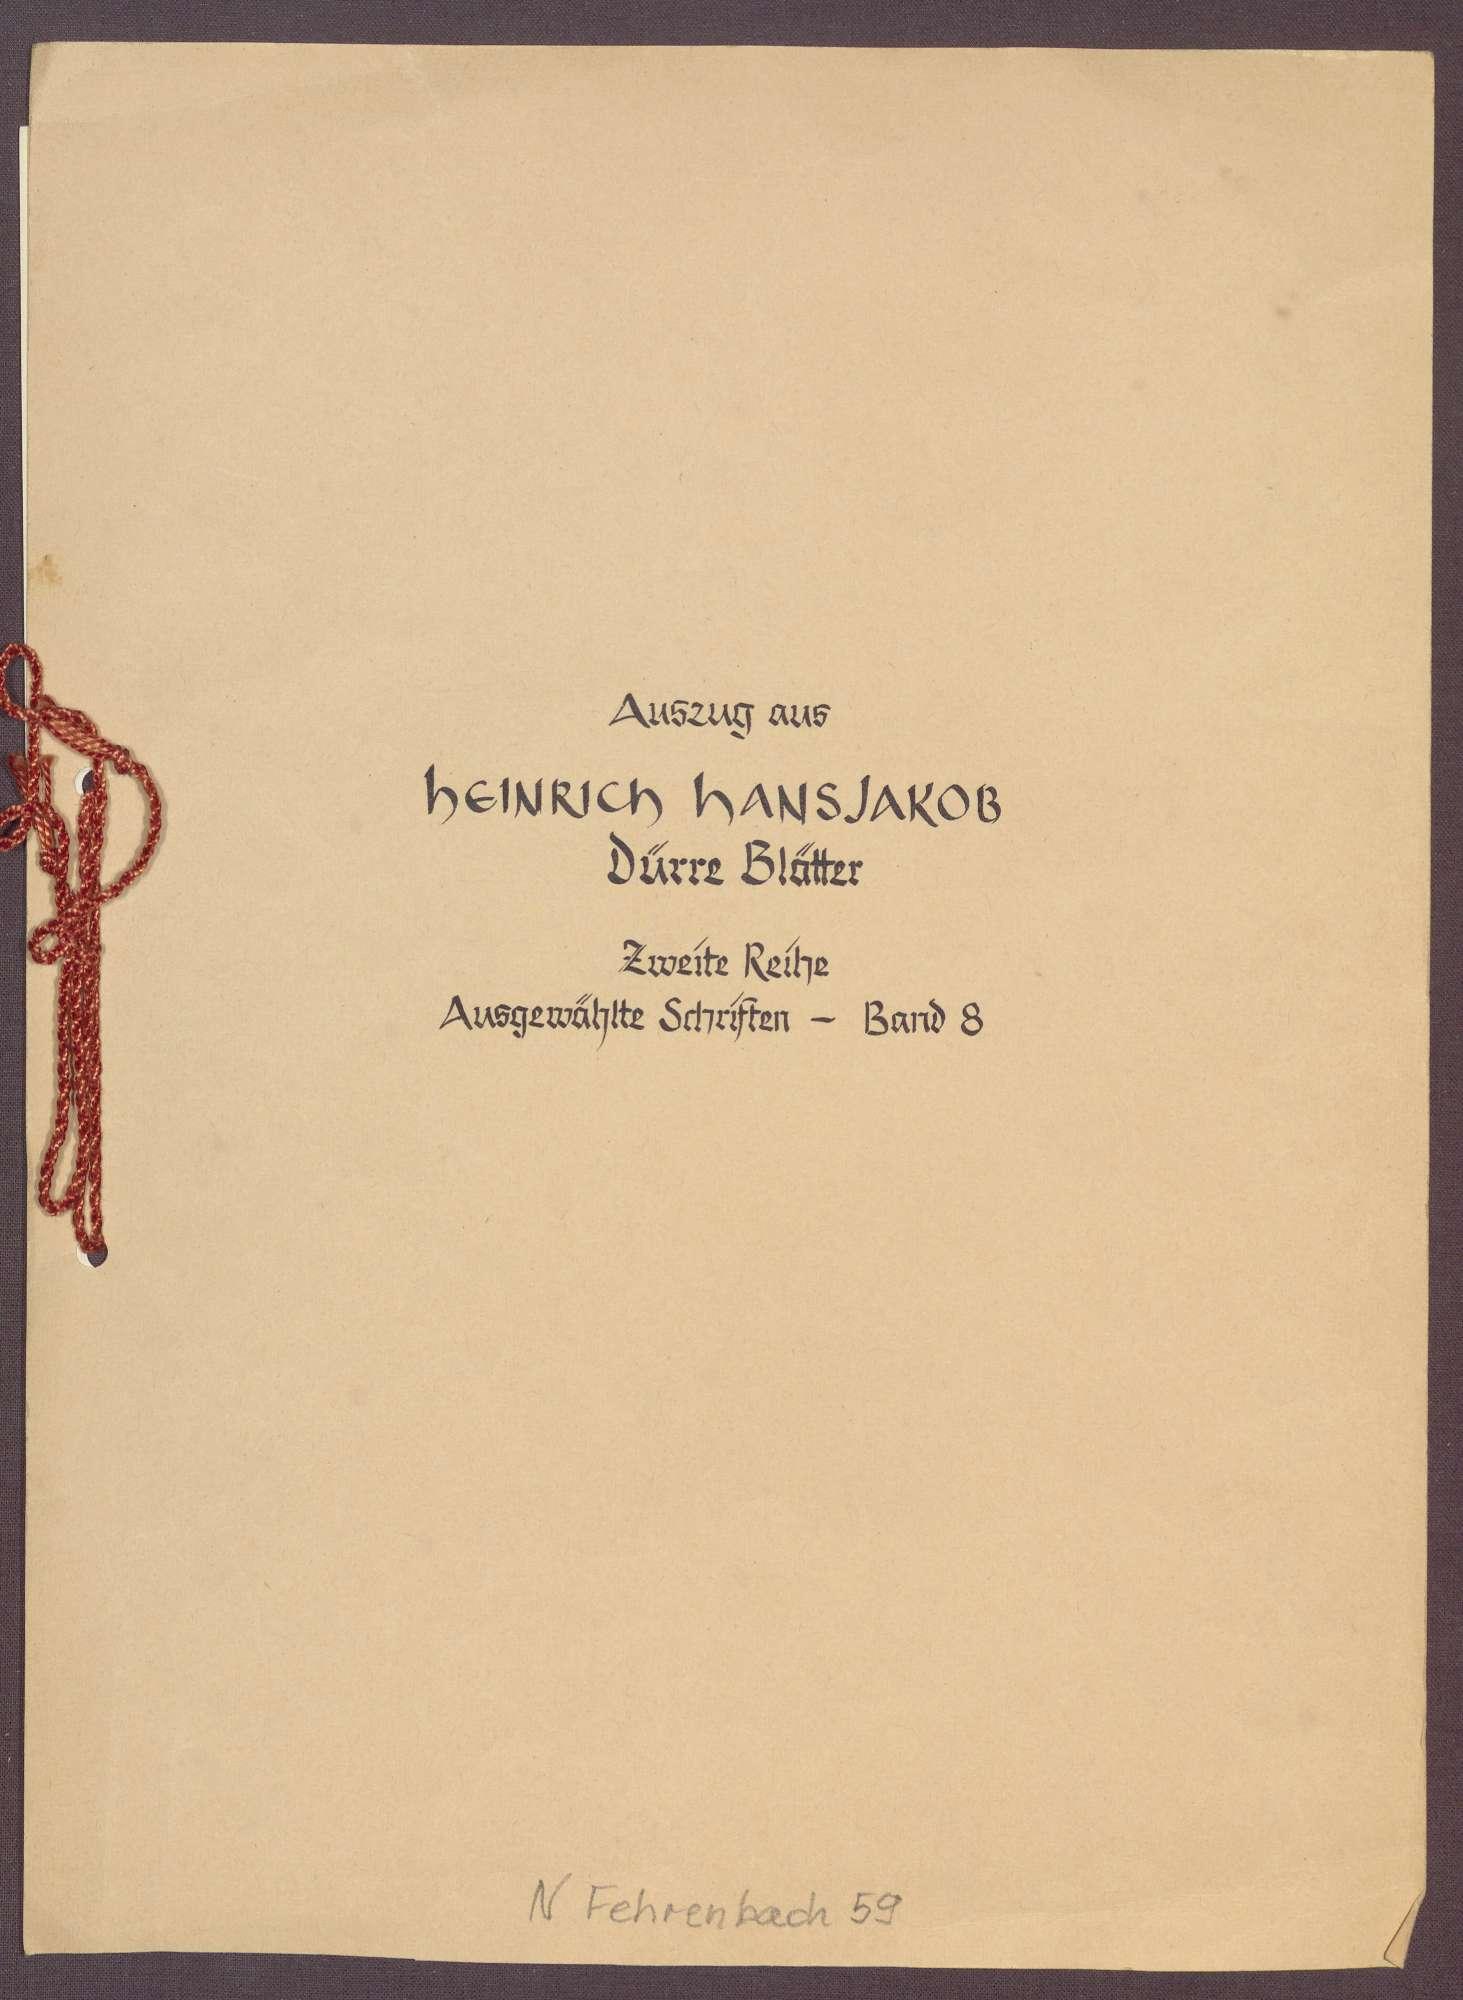 Heinrich Hansjakob, Dürre Blätter (Auszug), Bild 1